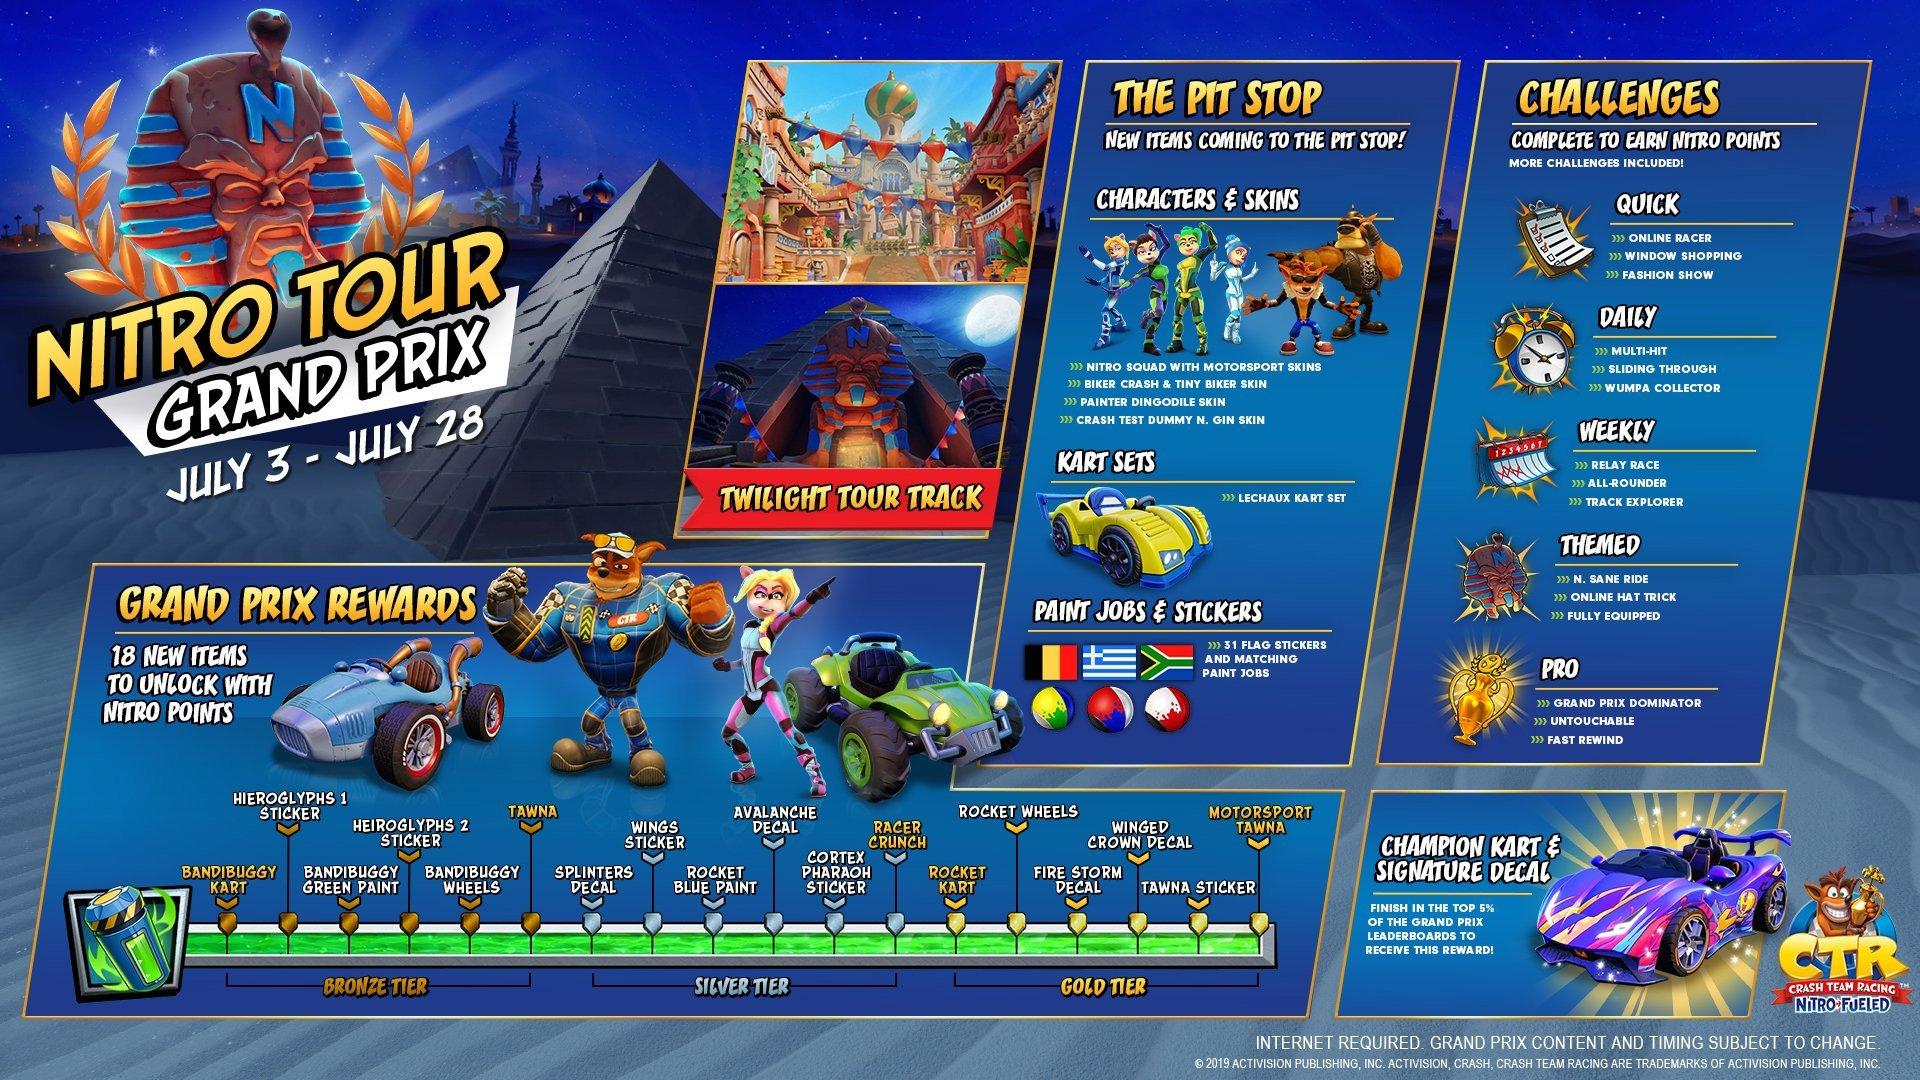 The Full Crash Team Racing Nitro Tour Grand Prix rewards roadmap